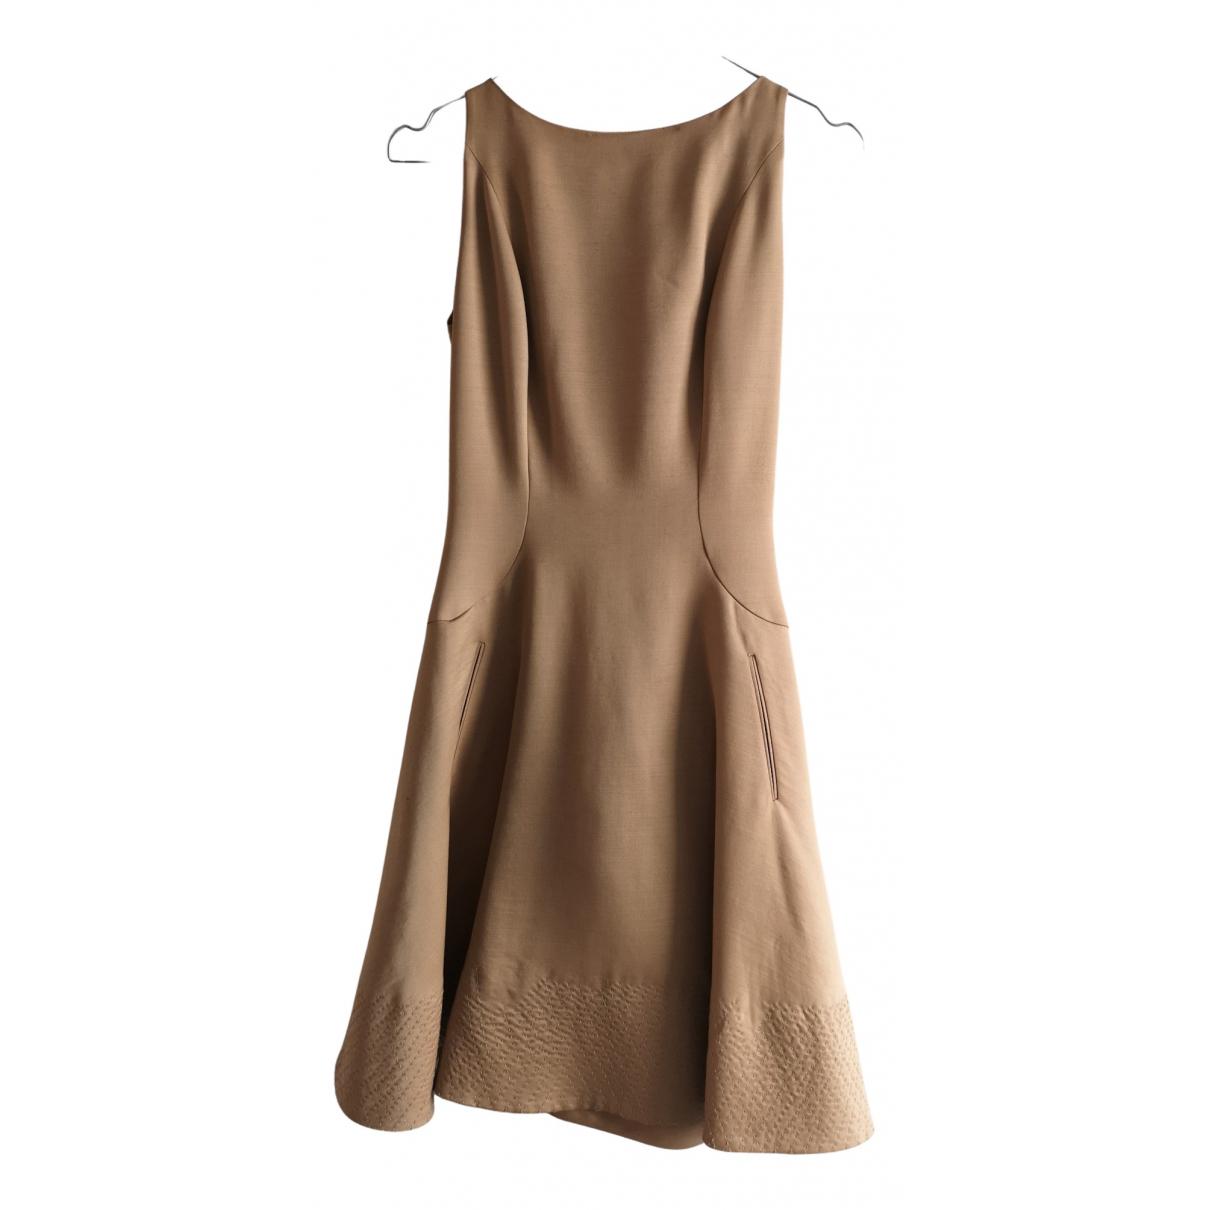 Bottega Veneta N Camel Wool dress for Women 38 IT